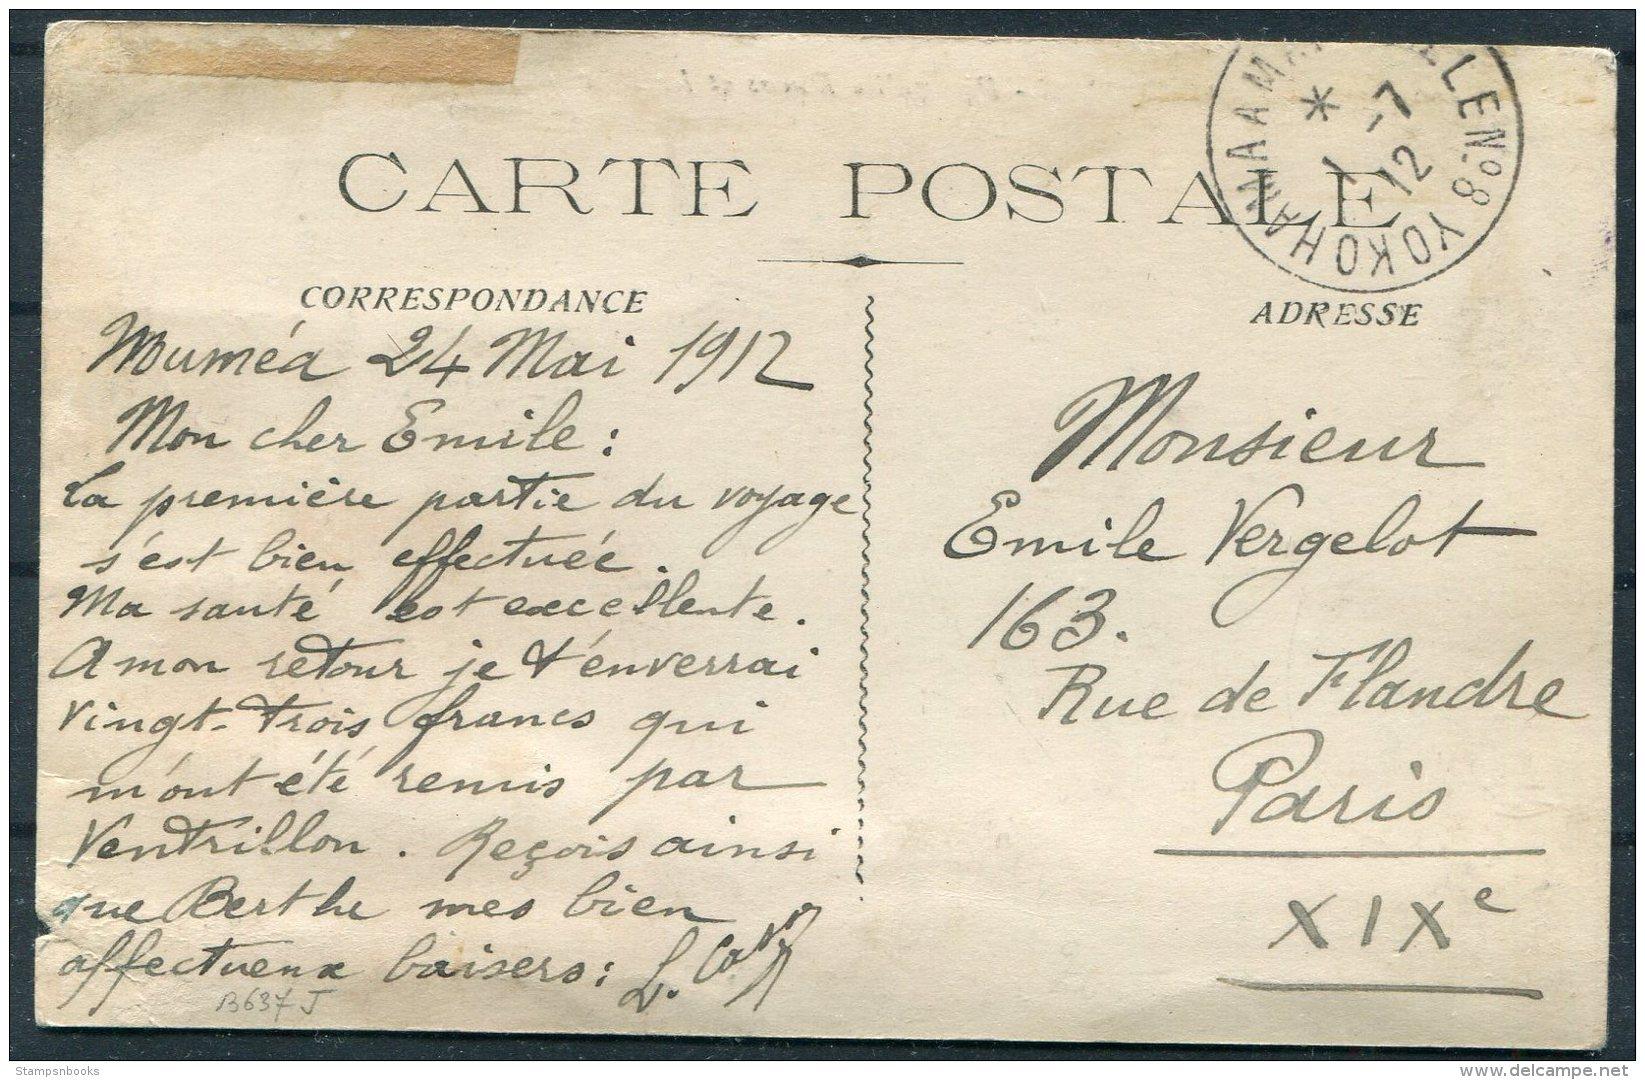 1912 New Caledonia Postcard, Yokohama Maseille Paquebot - Paris. Ship NERA - Nieuw-Caledonië